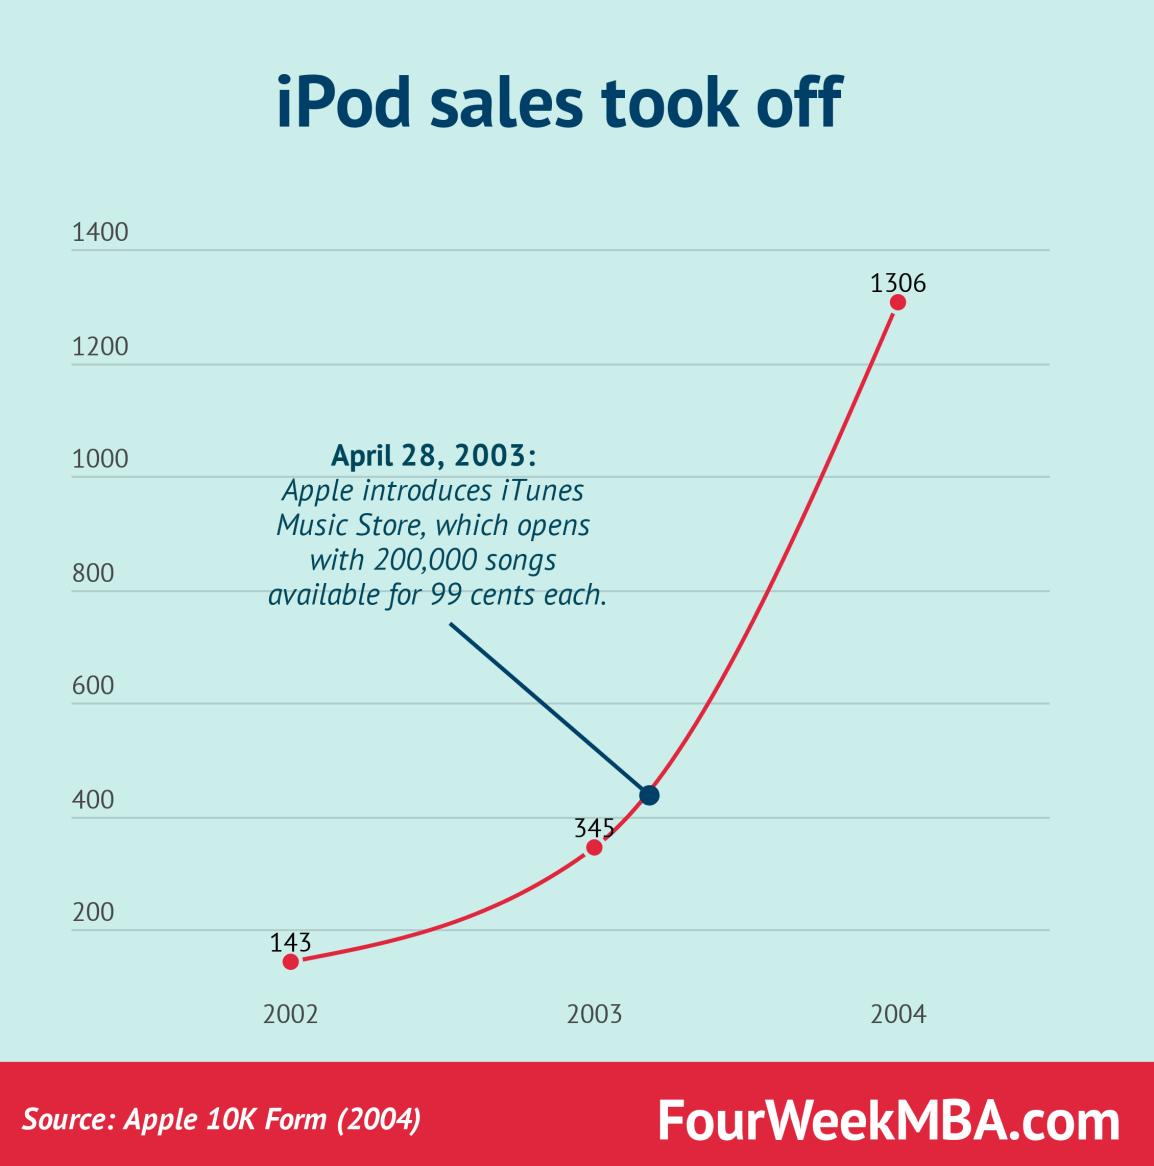 ipod-sales-took-off-2004